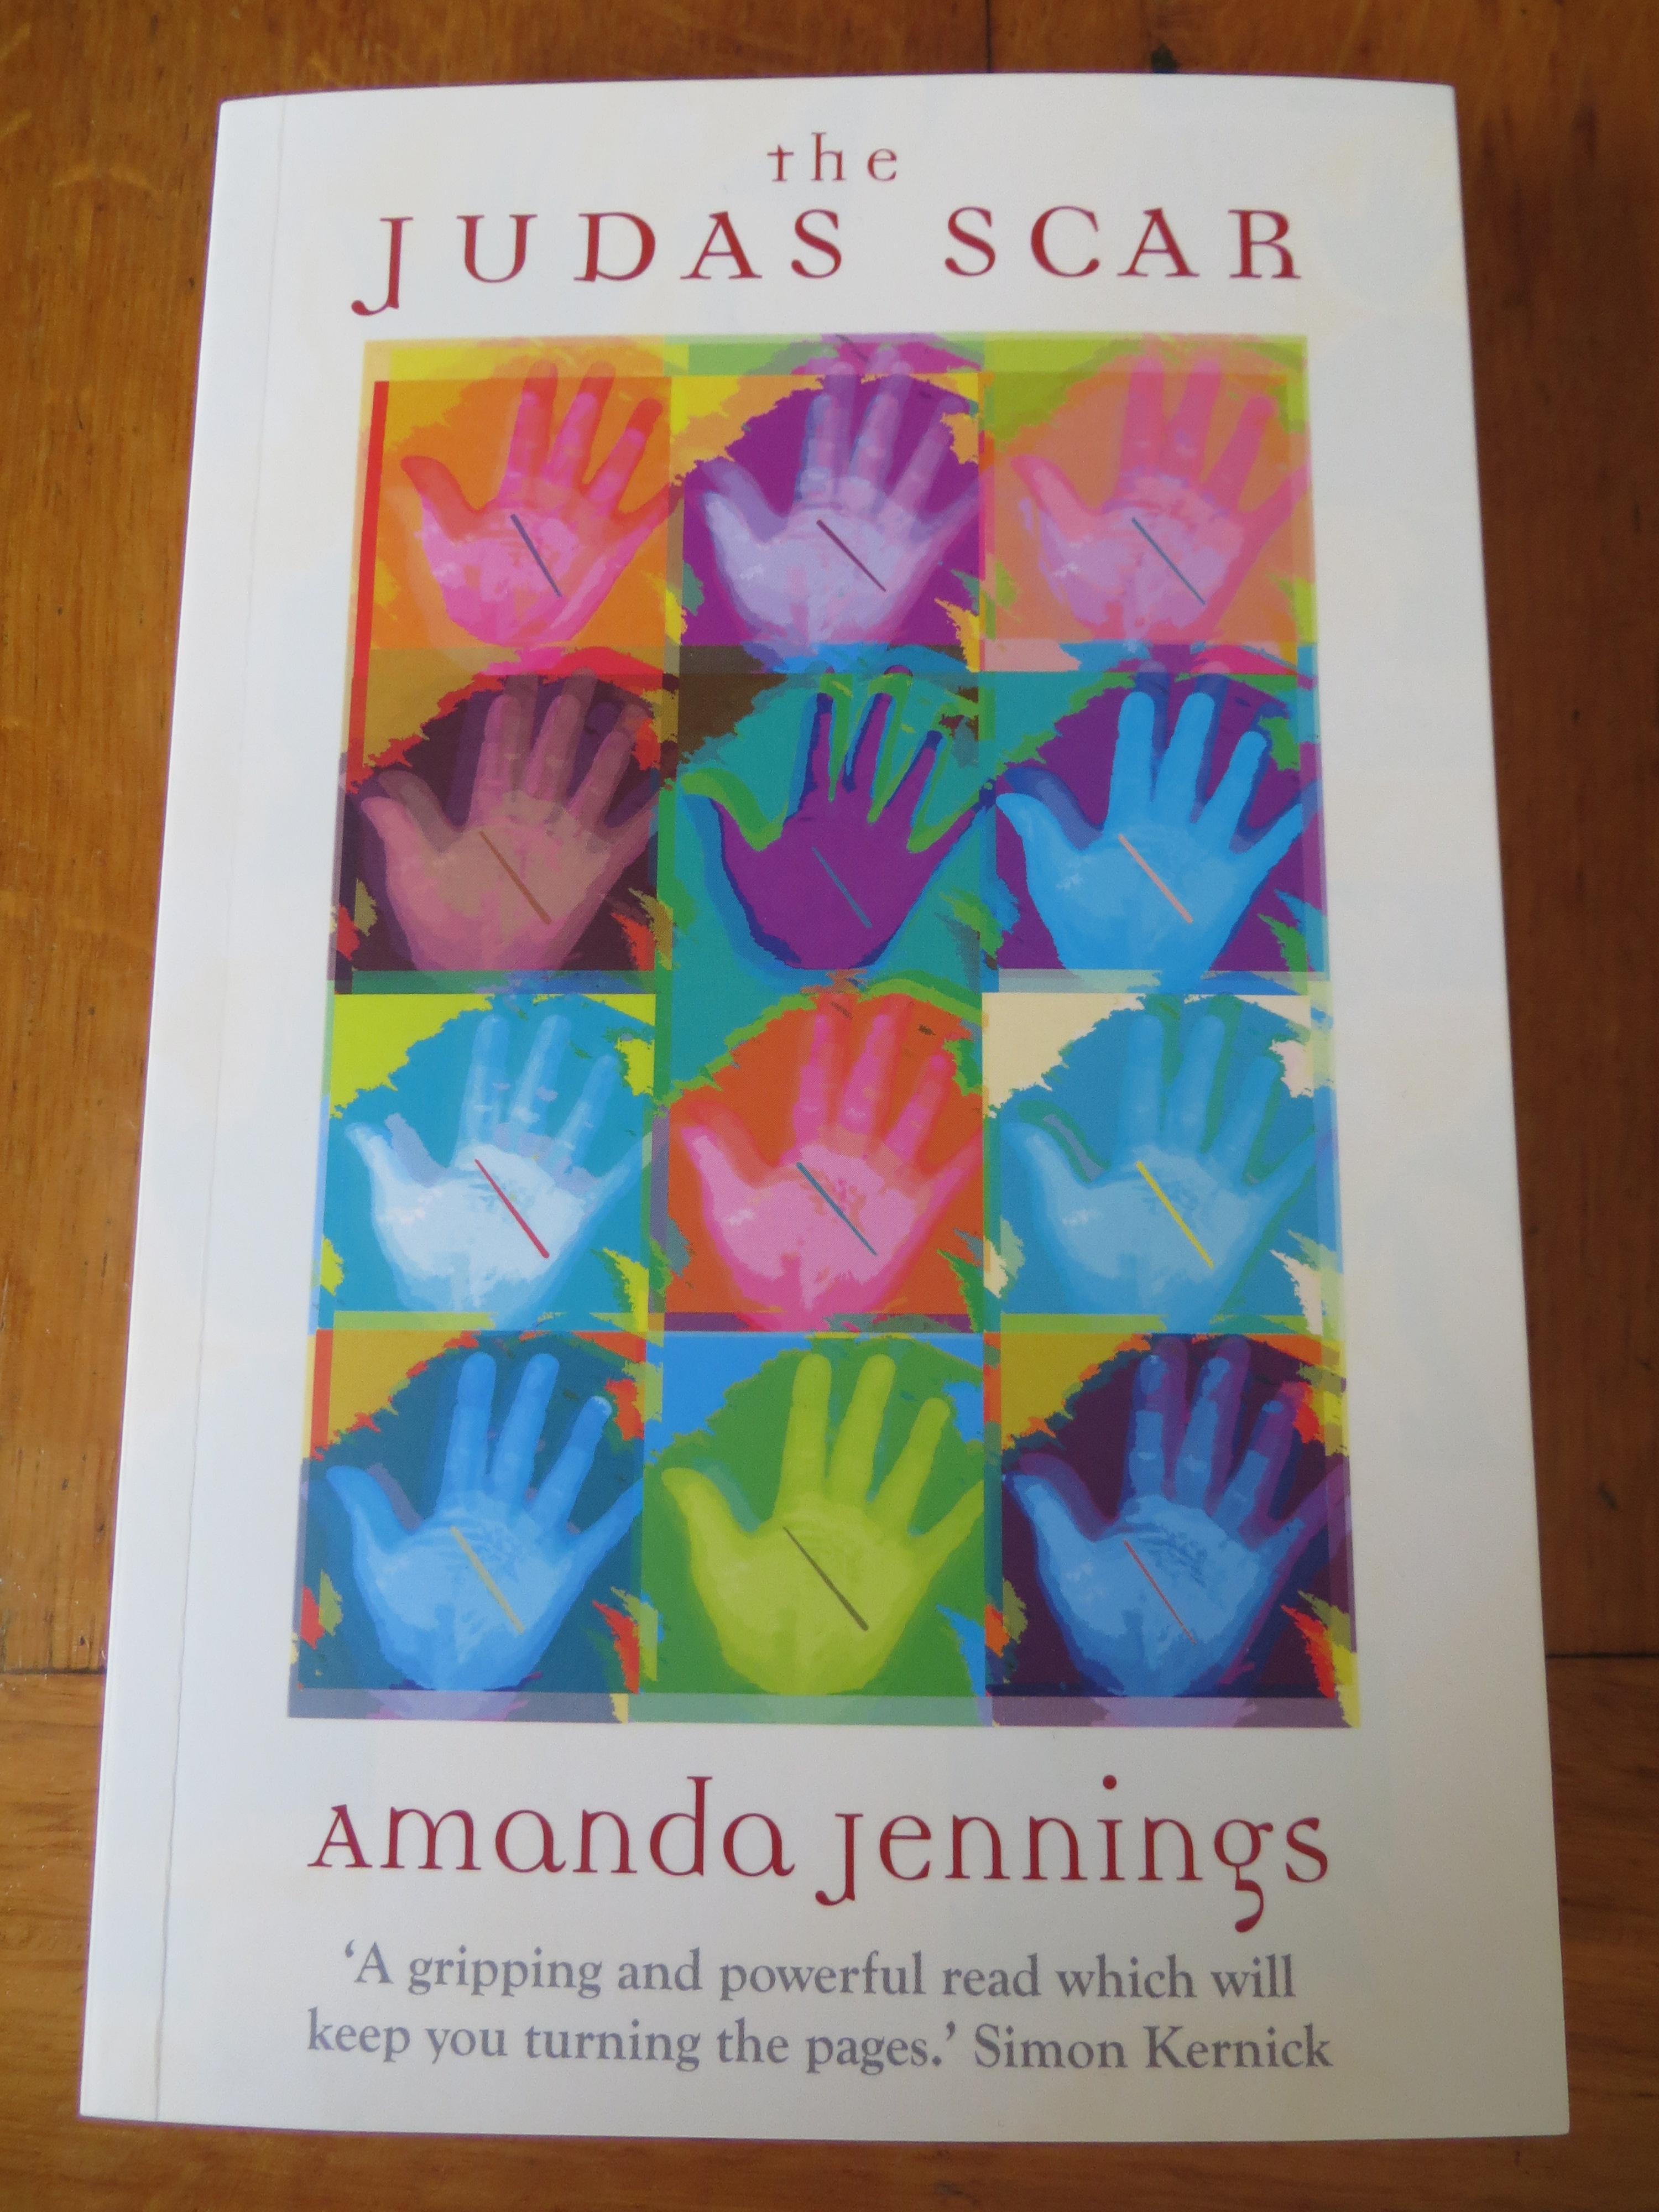 Amanda svi read book and shows her big breasts 7